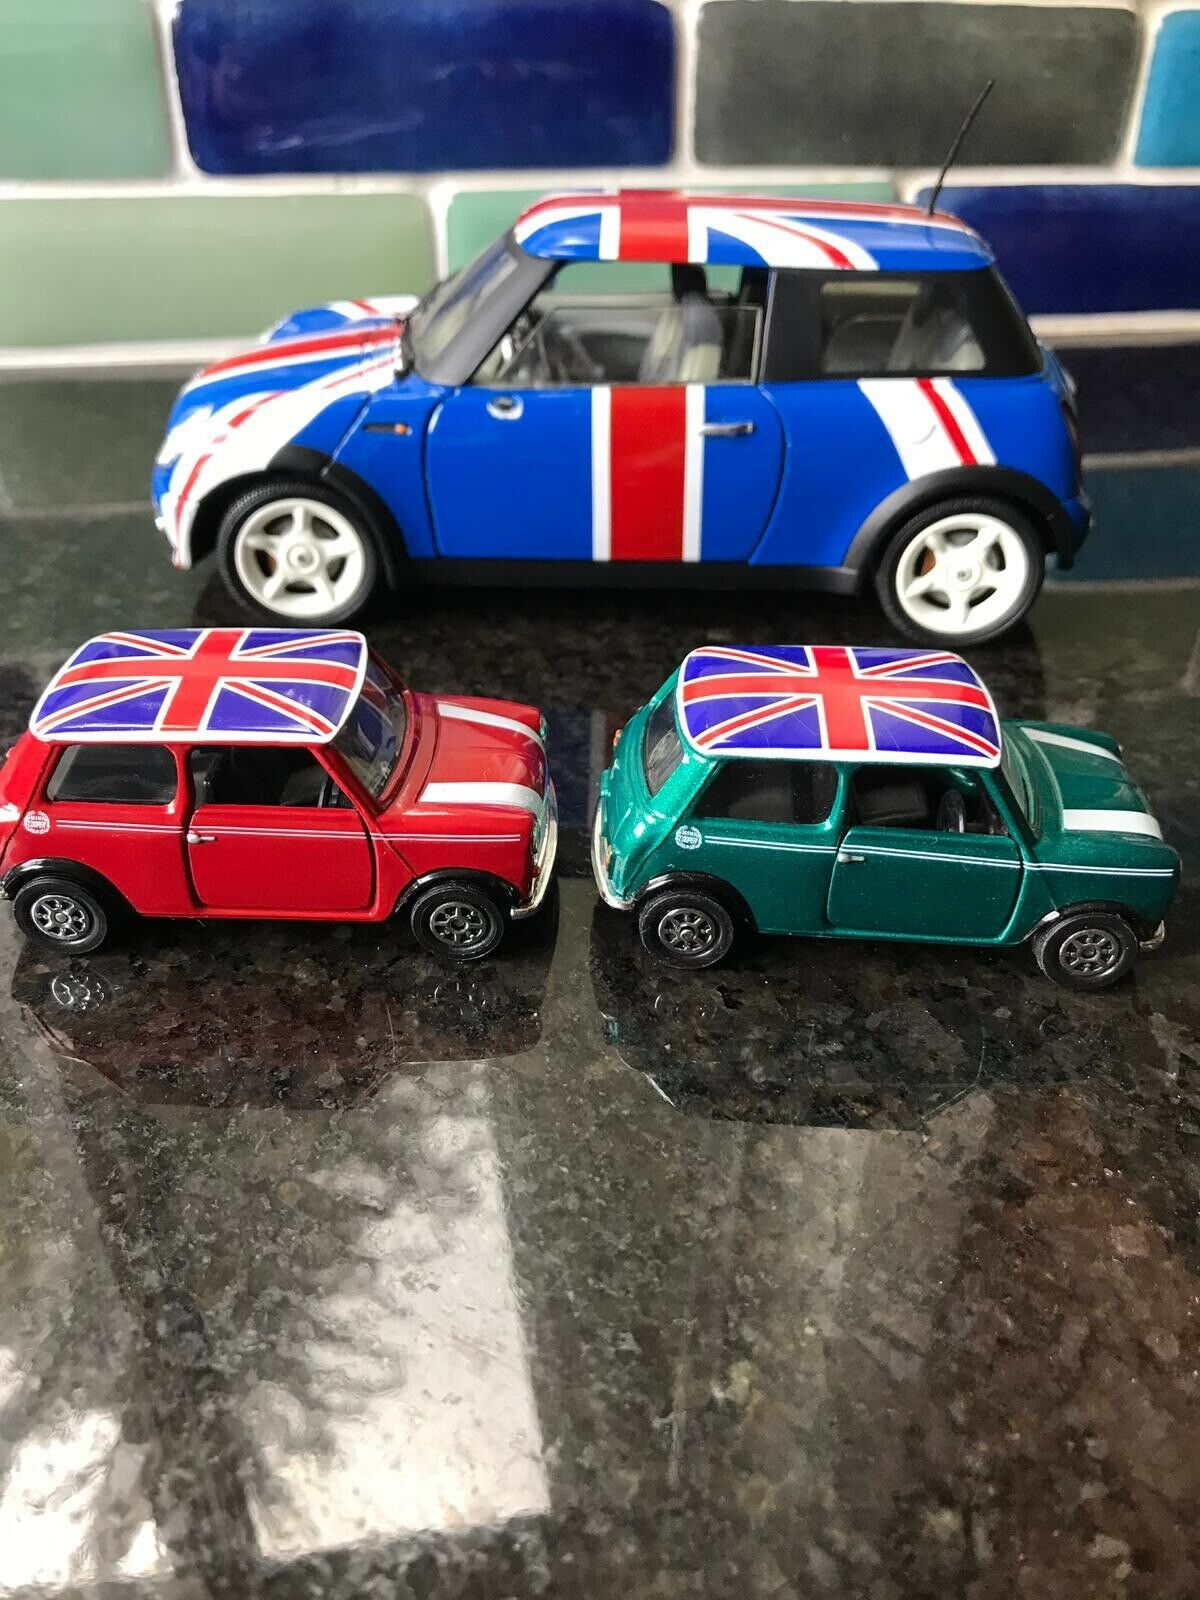 Collectible Austin Austin Austin Powers 1 18 DIECAST Mini Cooper Movie Toy Car Limited Edition 614791